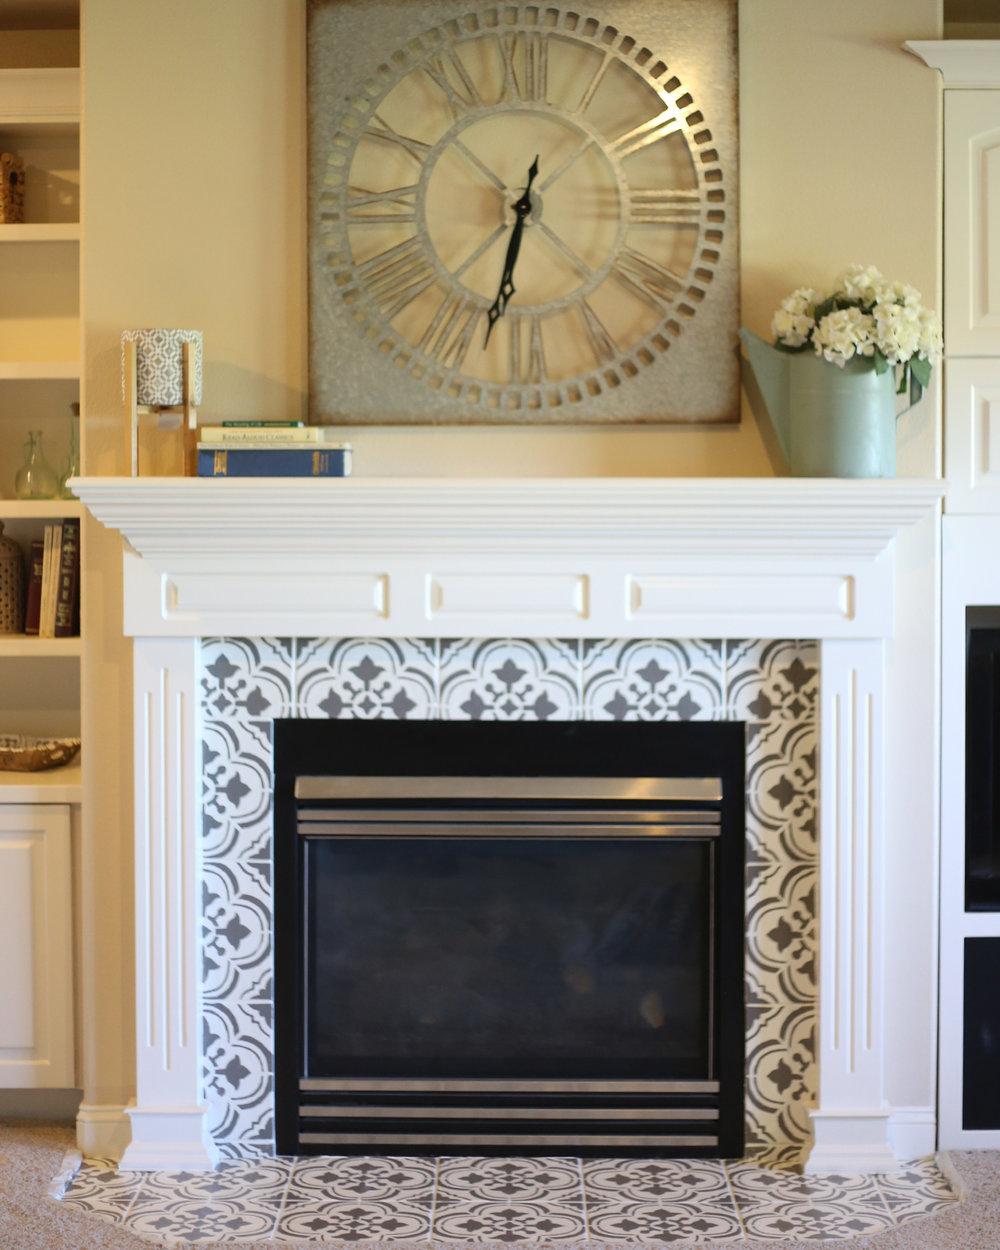 Fireplace3.jpg